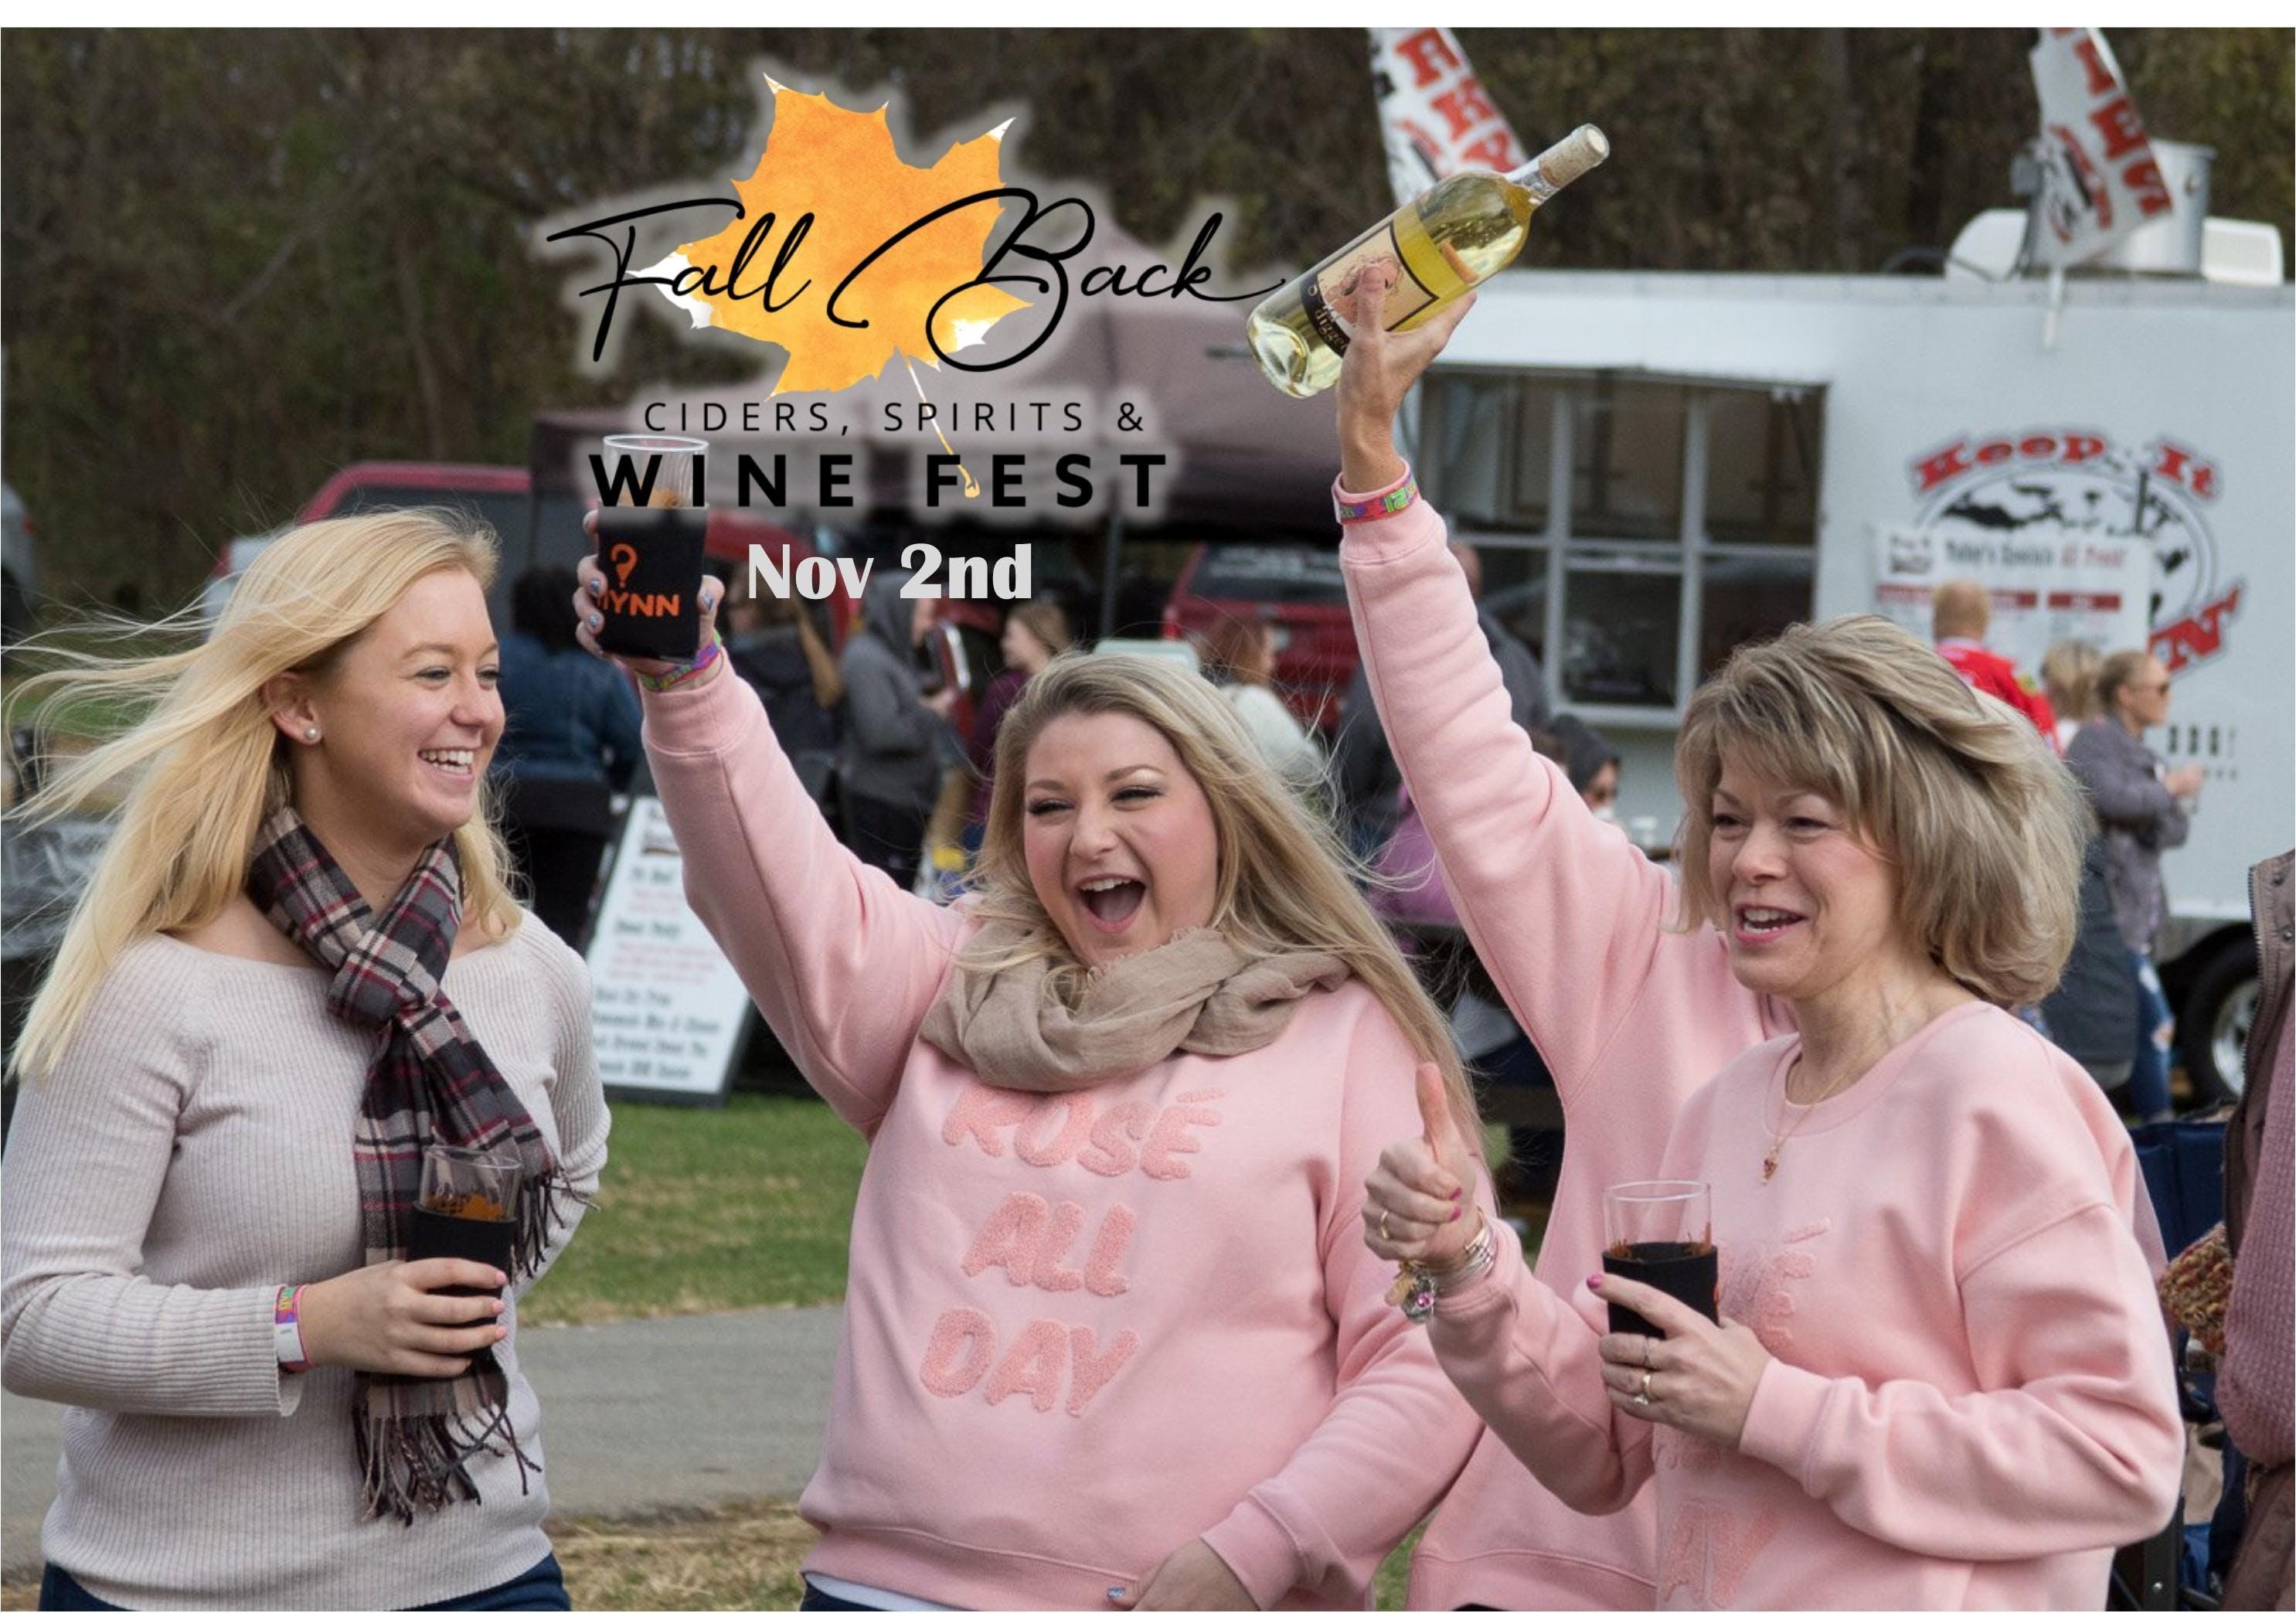 Fall Back Ciders, Spirits & Wine Fest 2019